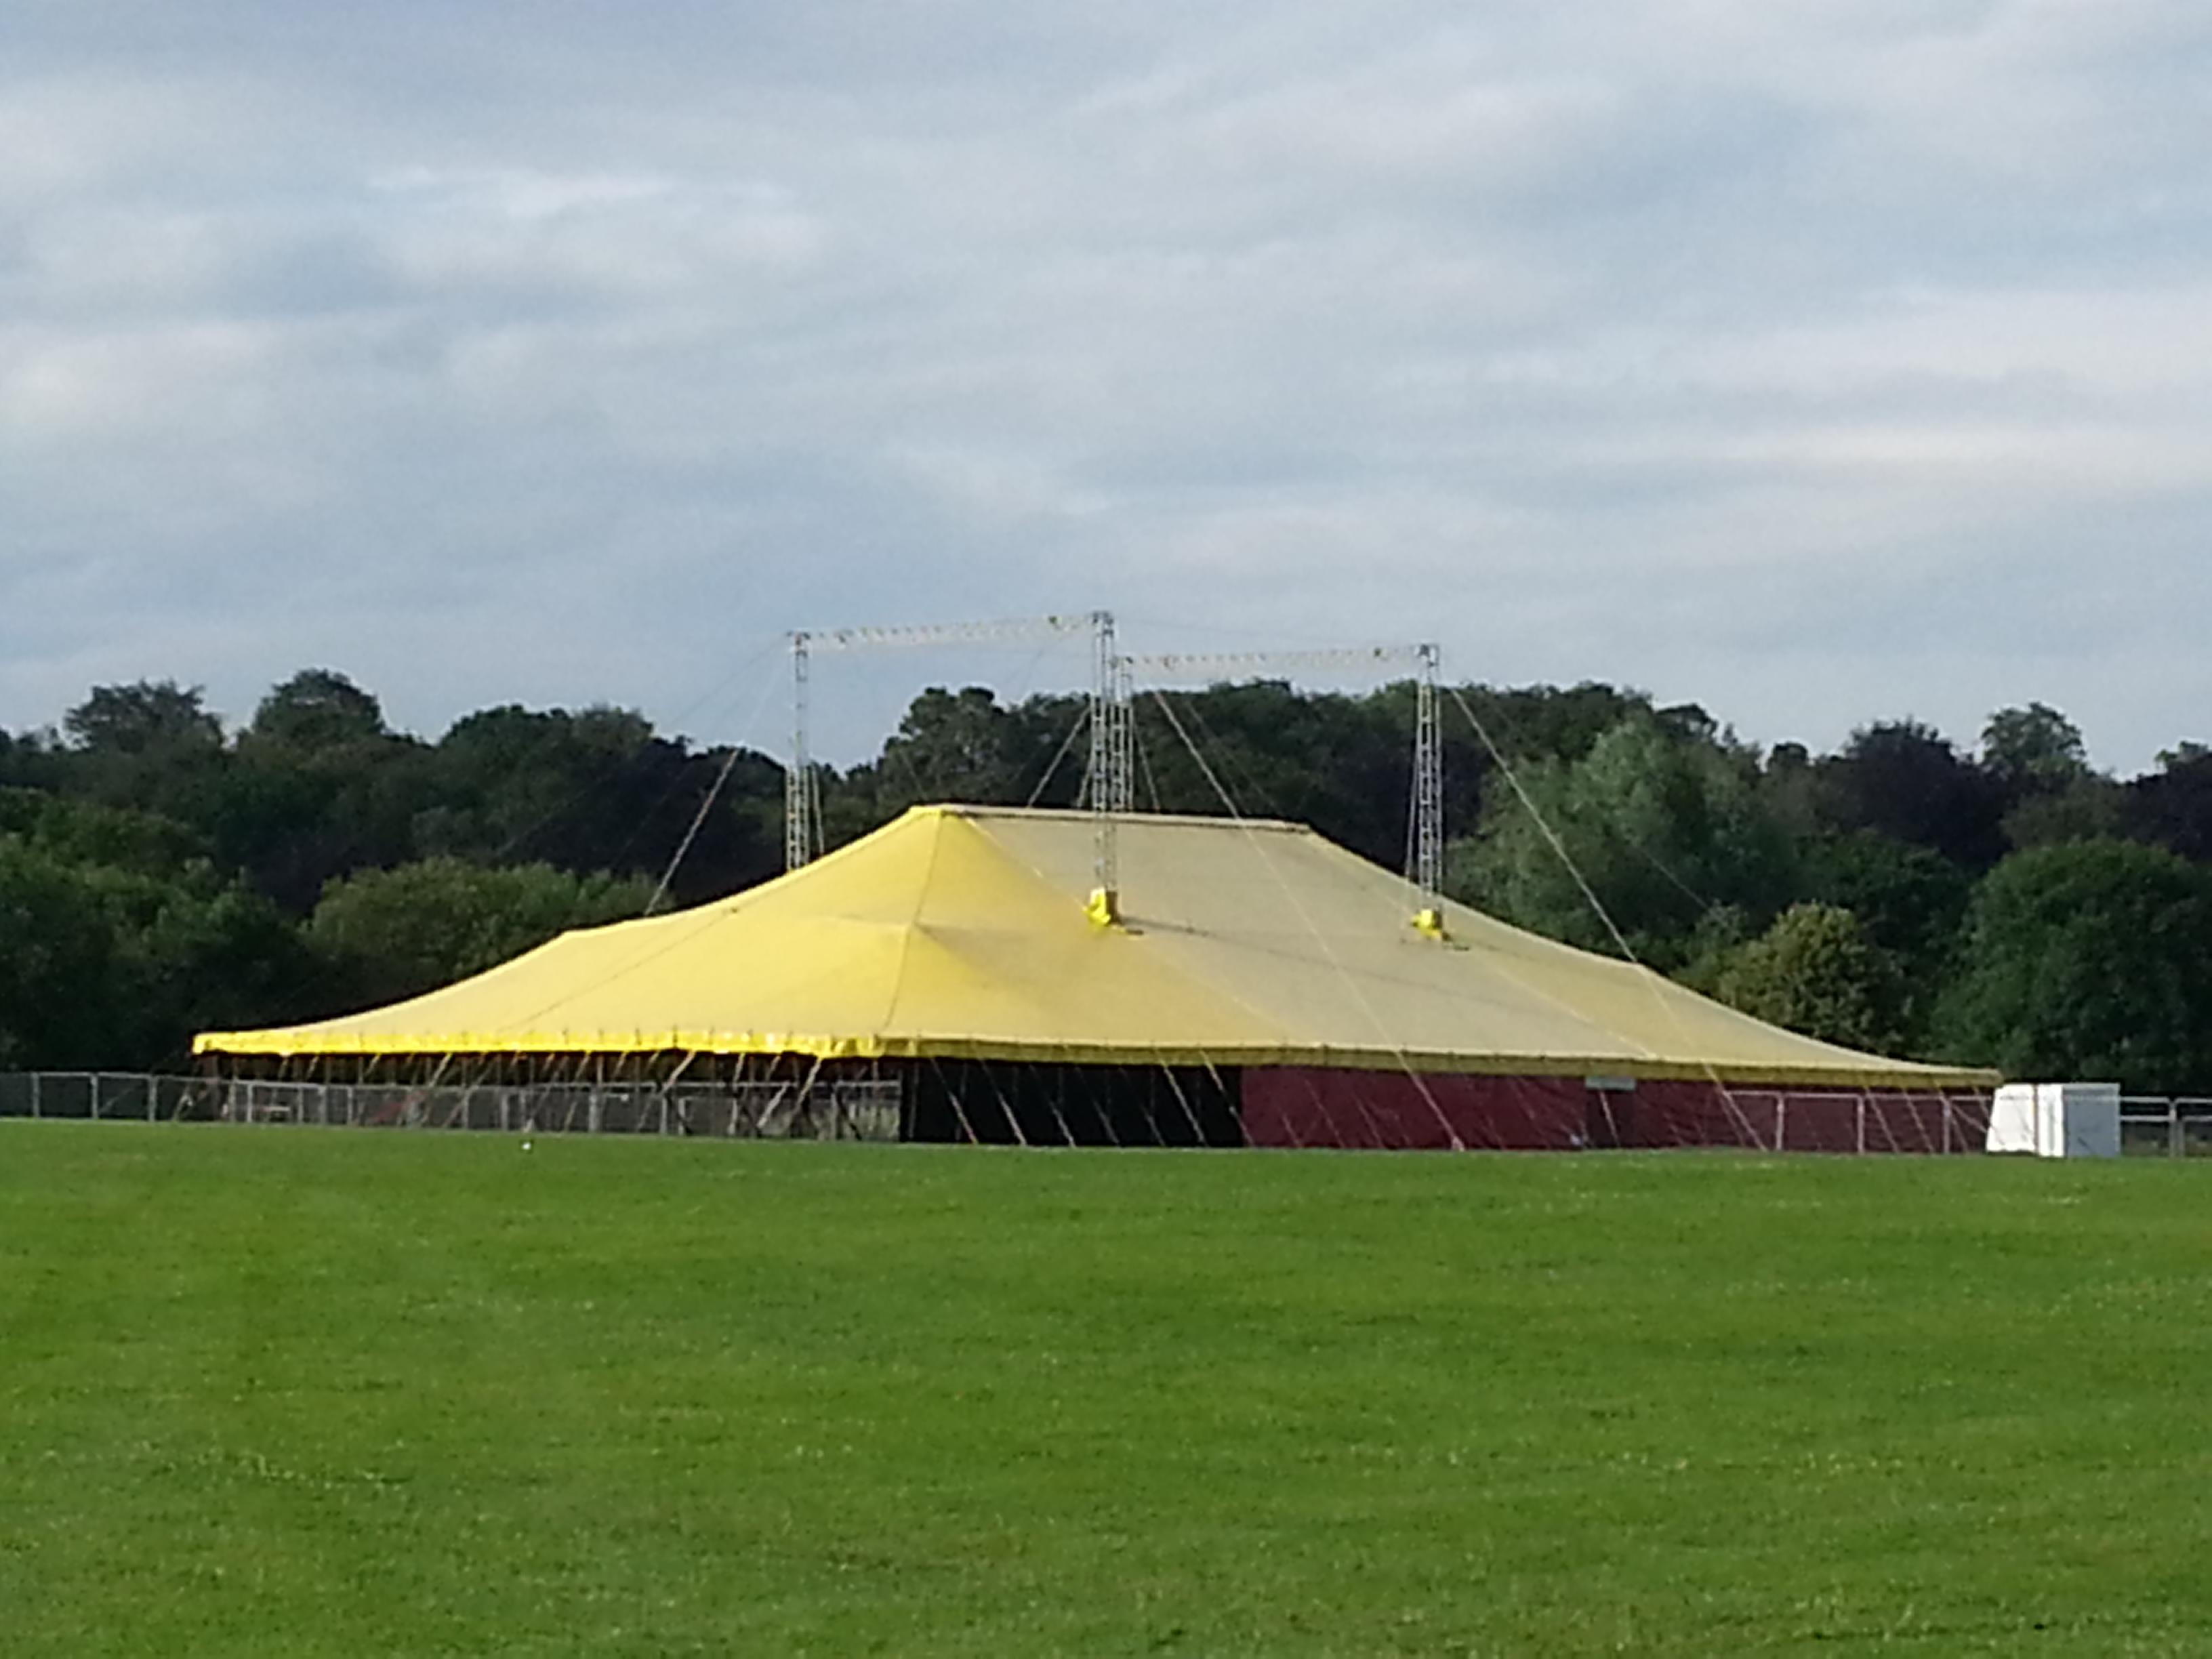 Circus Tent Hire Wiltshire & Circus Tent Hire Wiltshire | Albion Woods